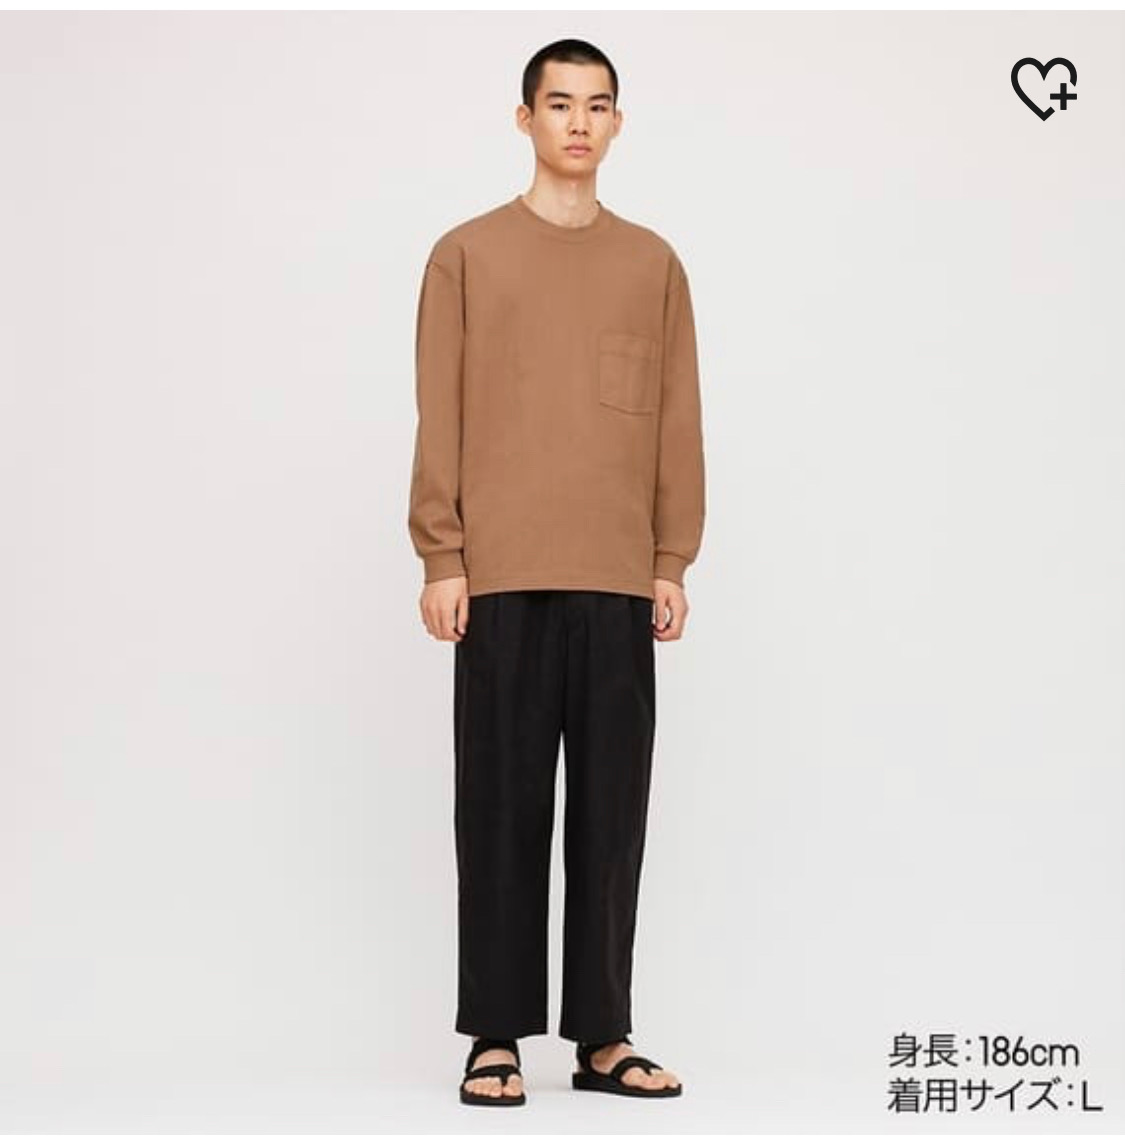 f:id:yamadaman0618:20200114235443j:plain